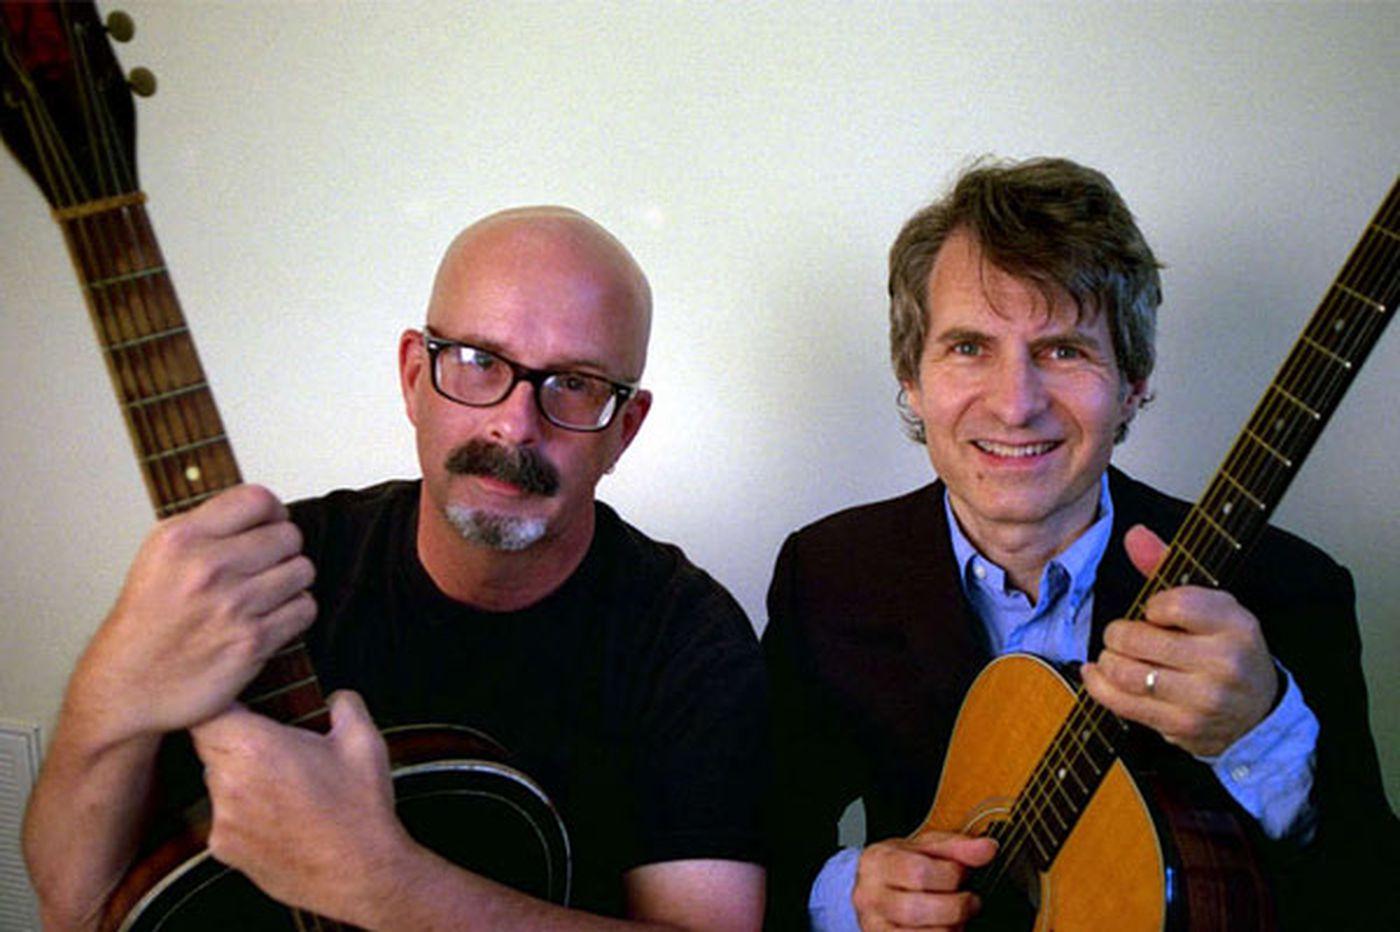 Holsapple and Stamey revisit album treasure at World Café Live